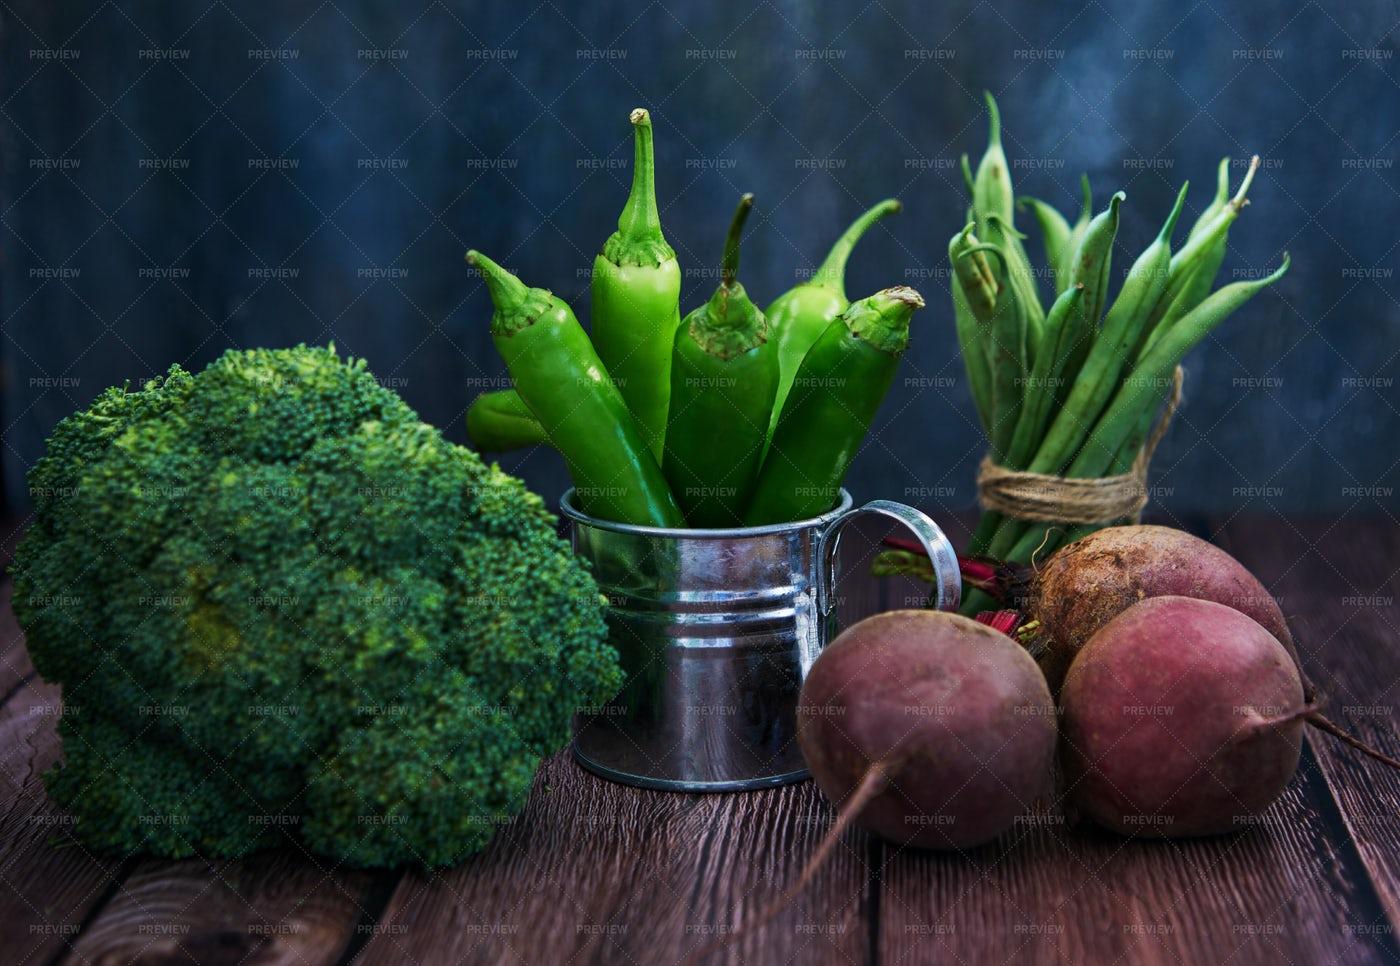 Raw Vegetables: Stock Photos